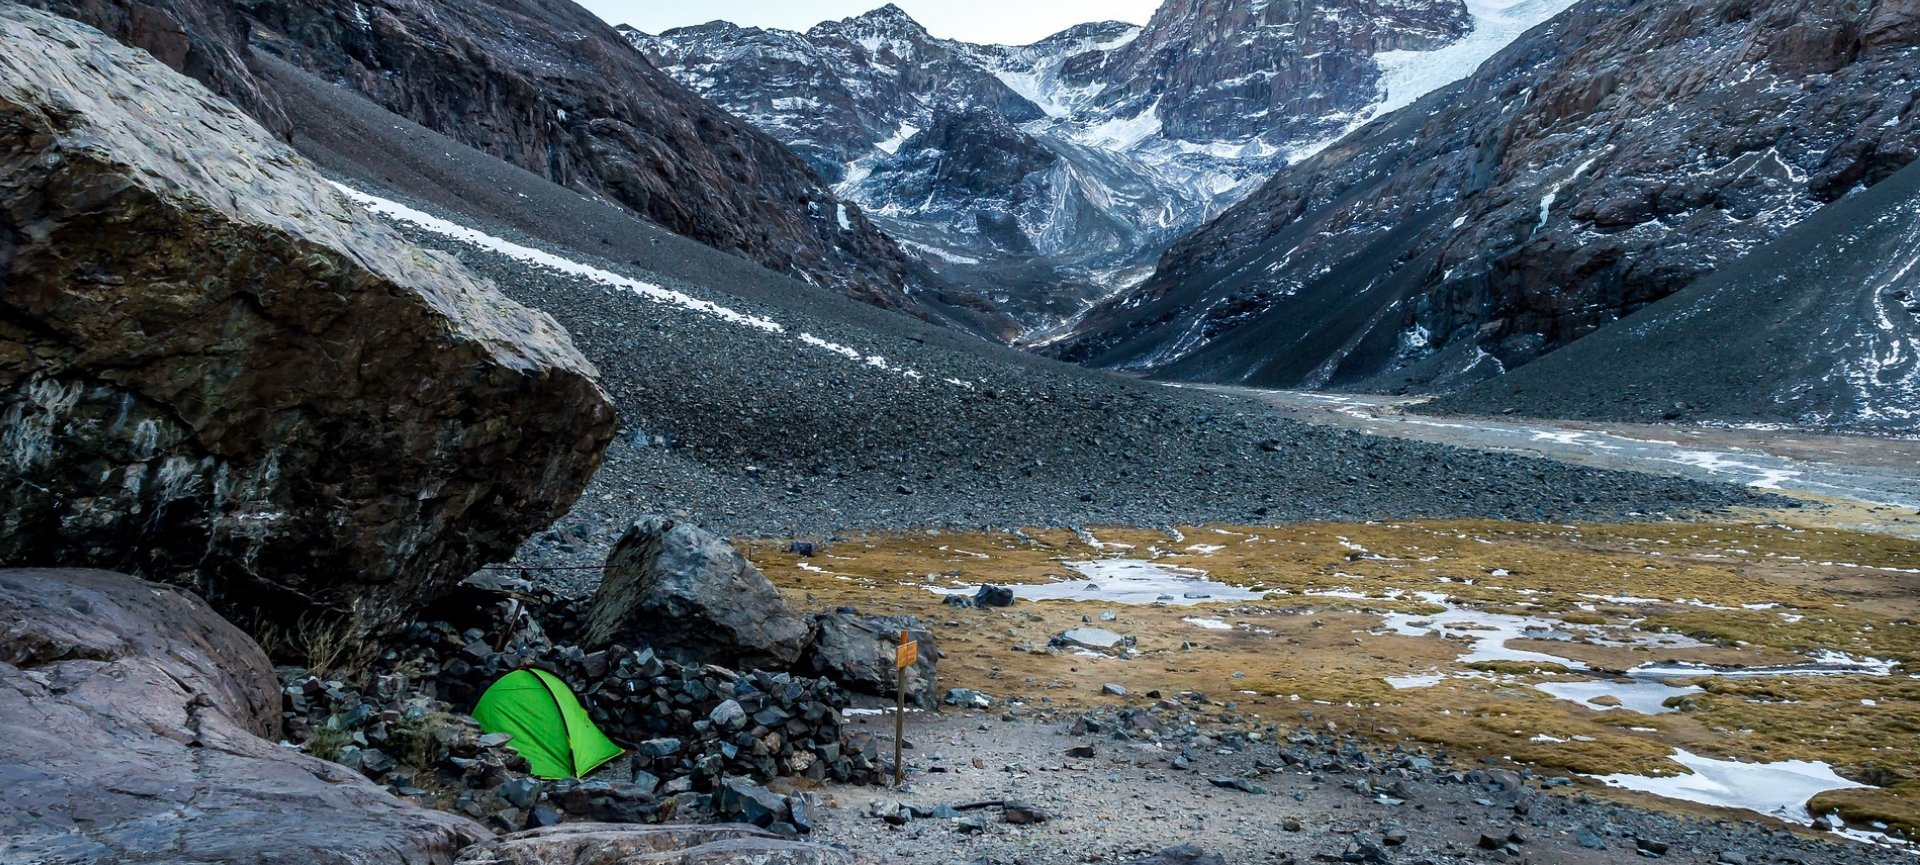 Scegliere tenda da trekking